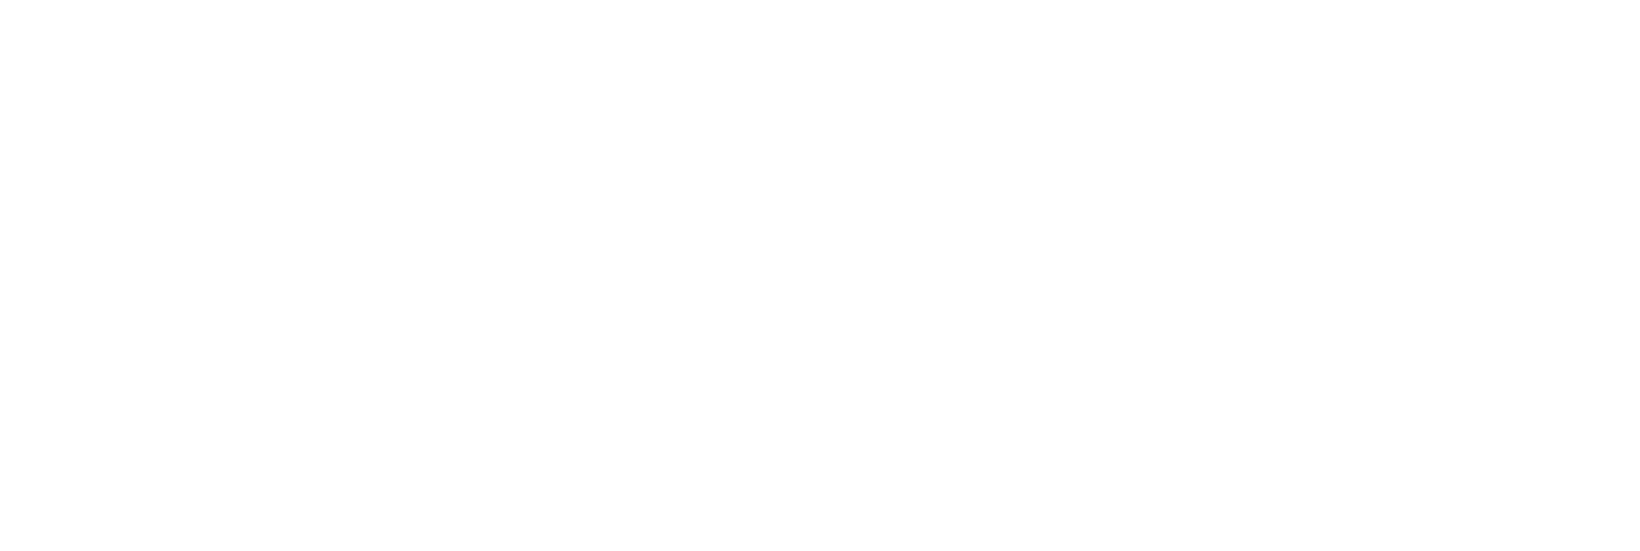 snake-xtra-length.png